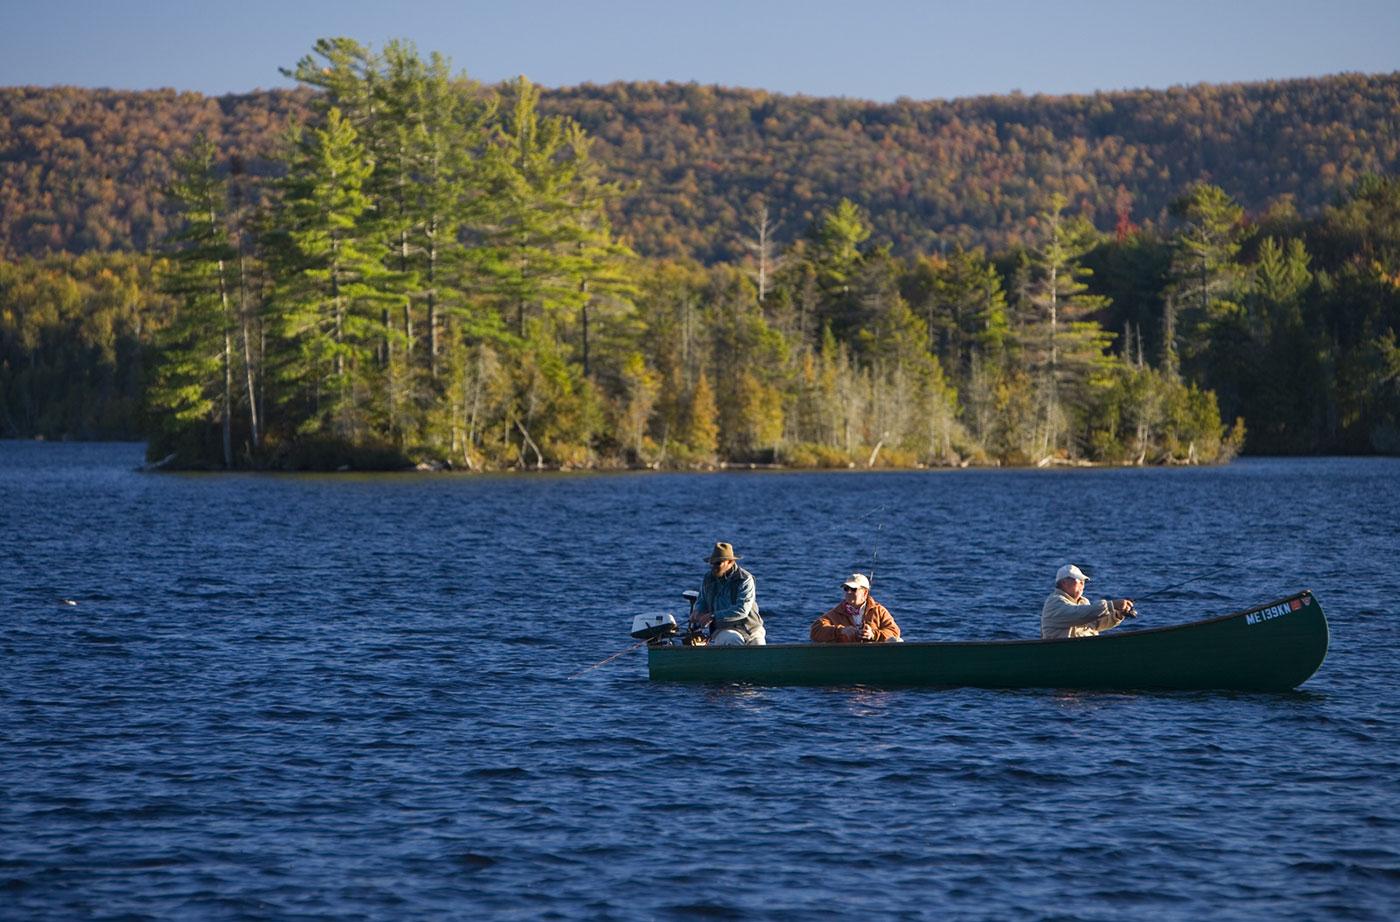 men in boat fishing on Moosehead Lake